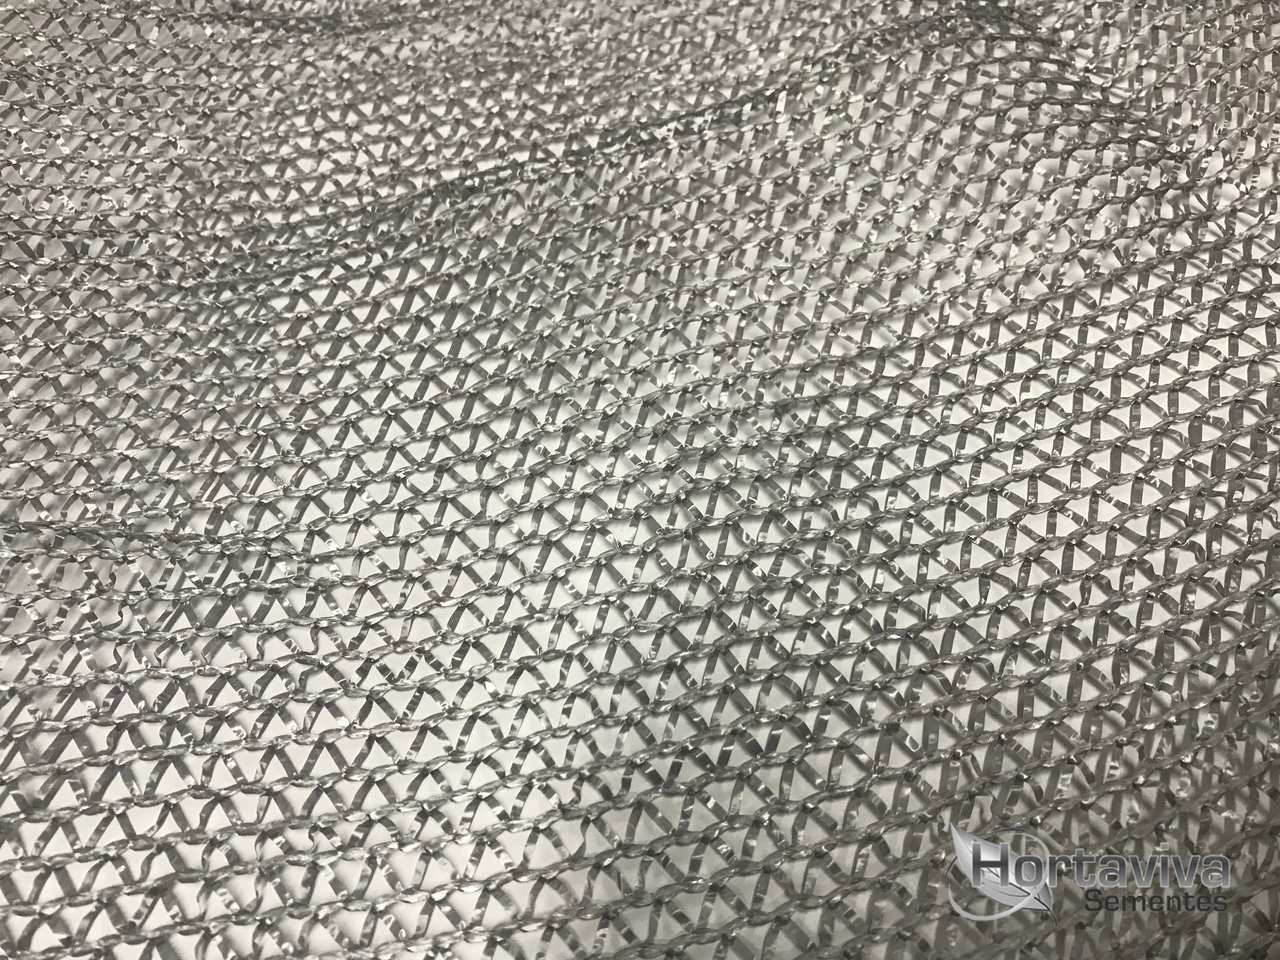 Tela de Sombreamento Prata Termo Refletora Freshnet - Largura: 12 Metros